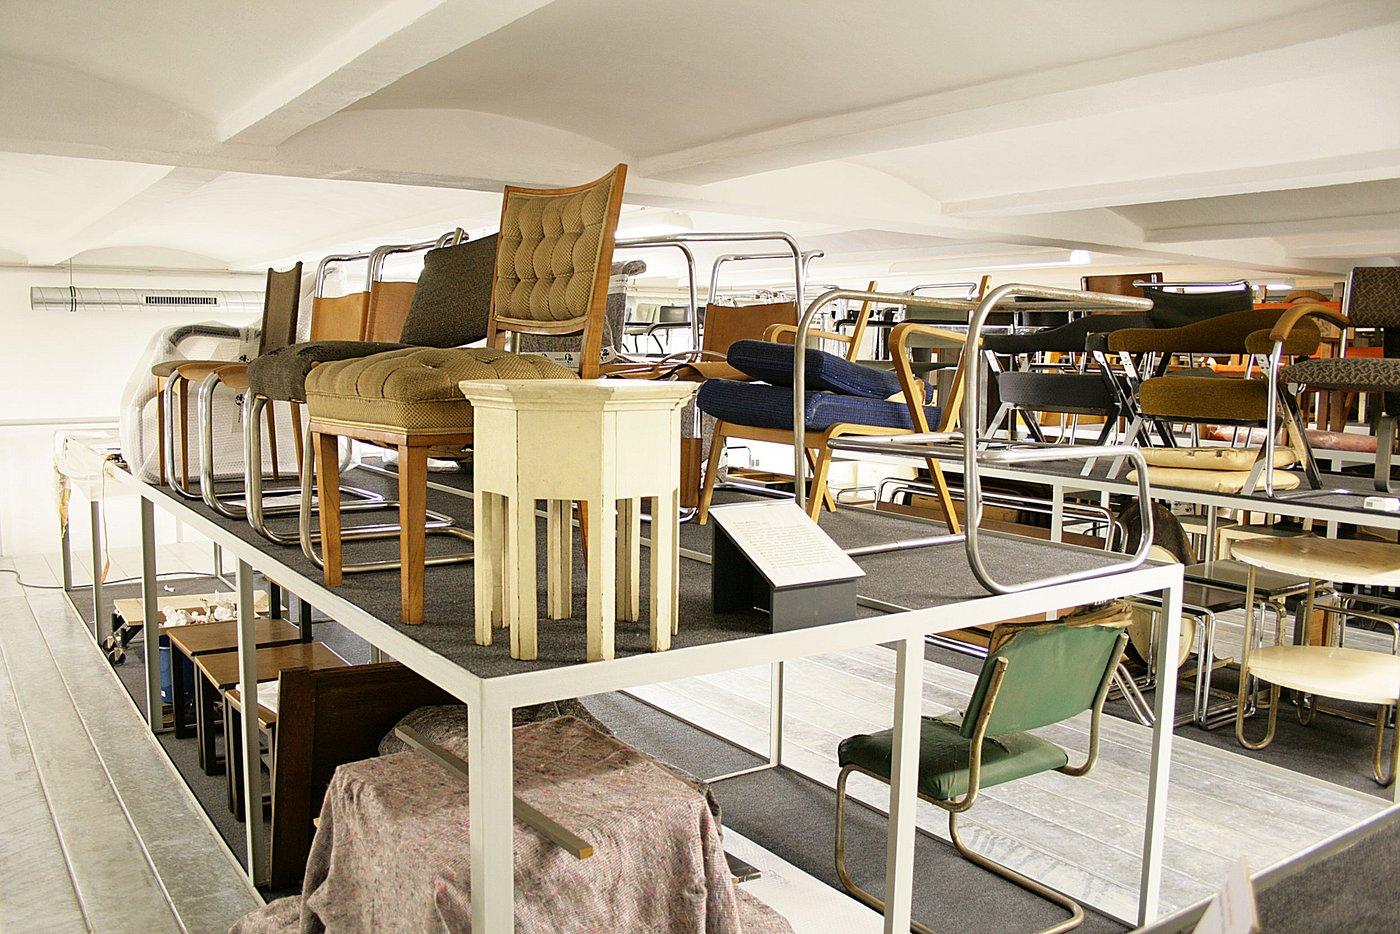 collection and archive collection stiftung bauhaus dessau bauhaus dessau foundation. Black Bedroom Furniture Sets. Home Design Ideas